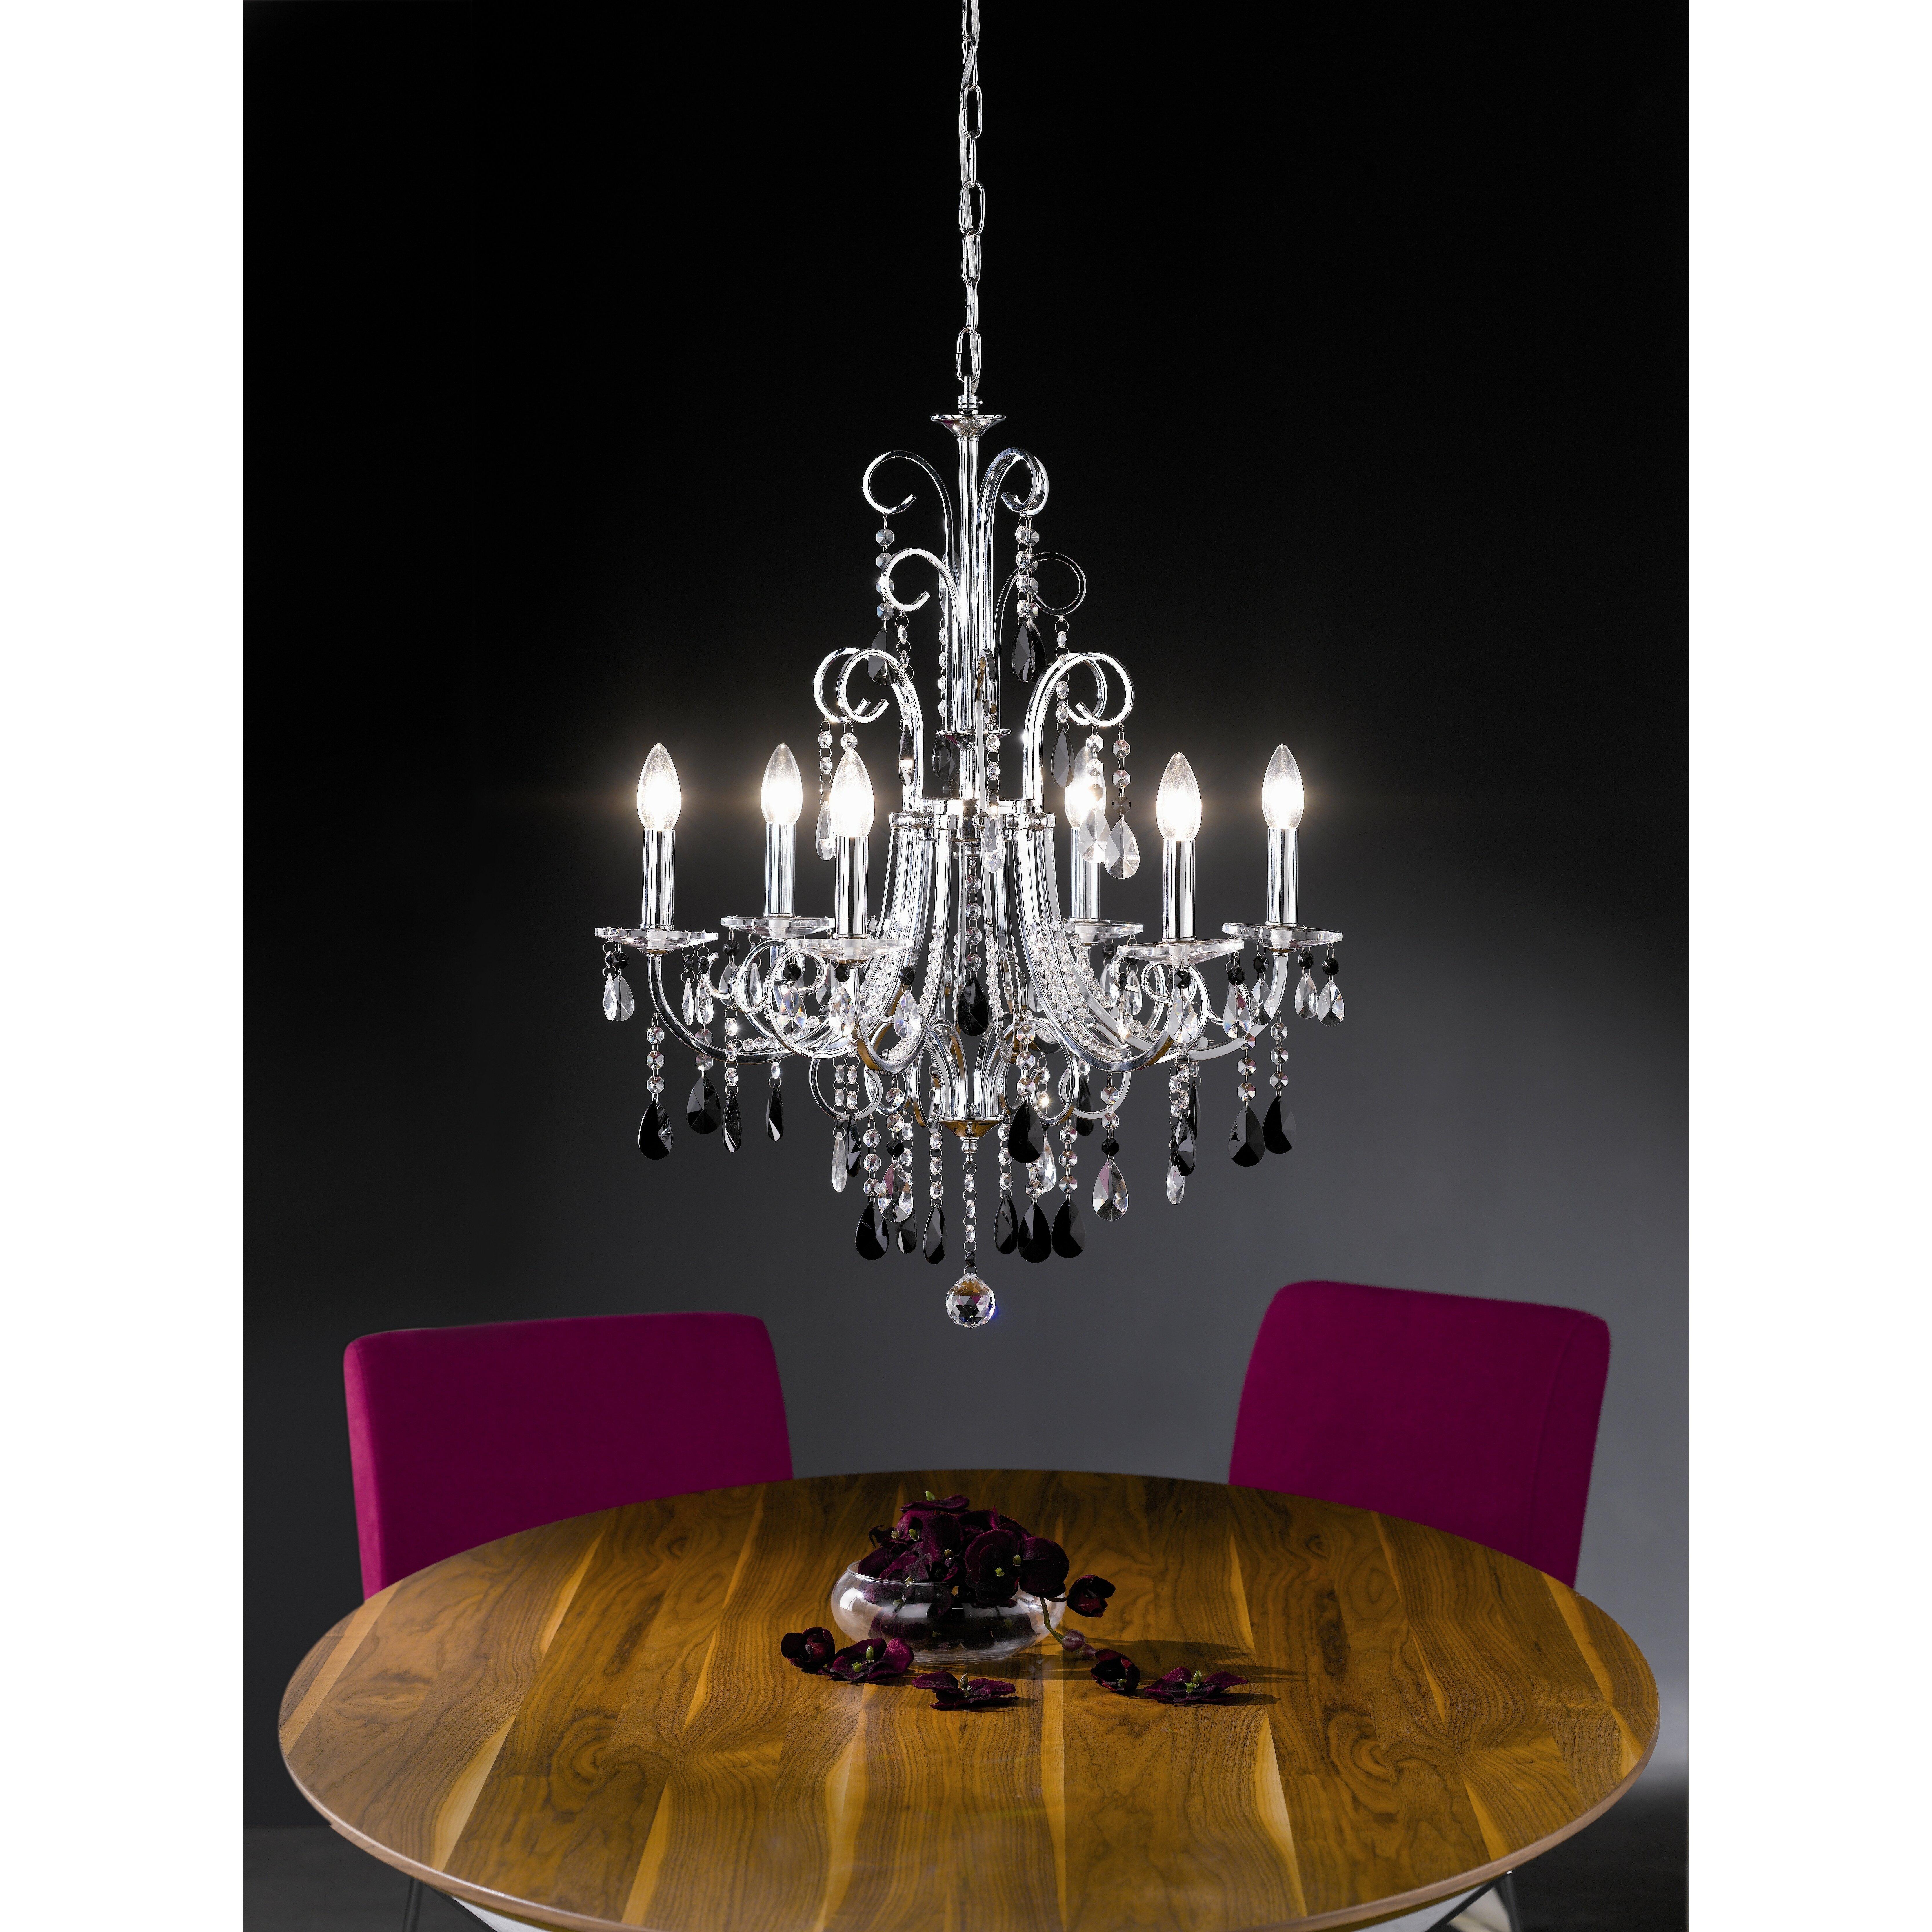 paul neuhaus gracia 6 light crystal chandelier reviews wayfair uk. Black Bedroom Furniture Sets. Home Design Ideas